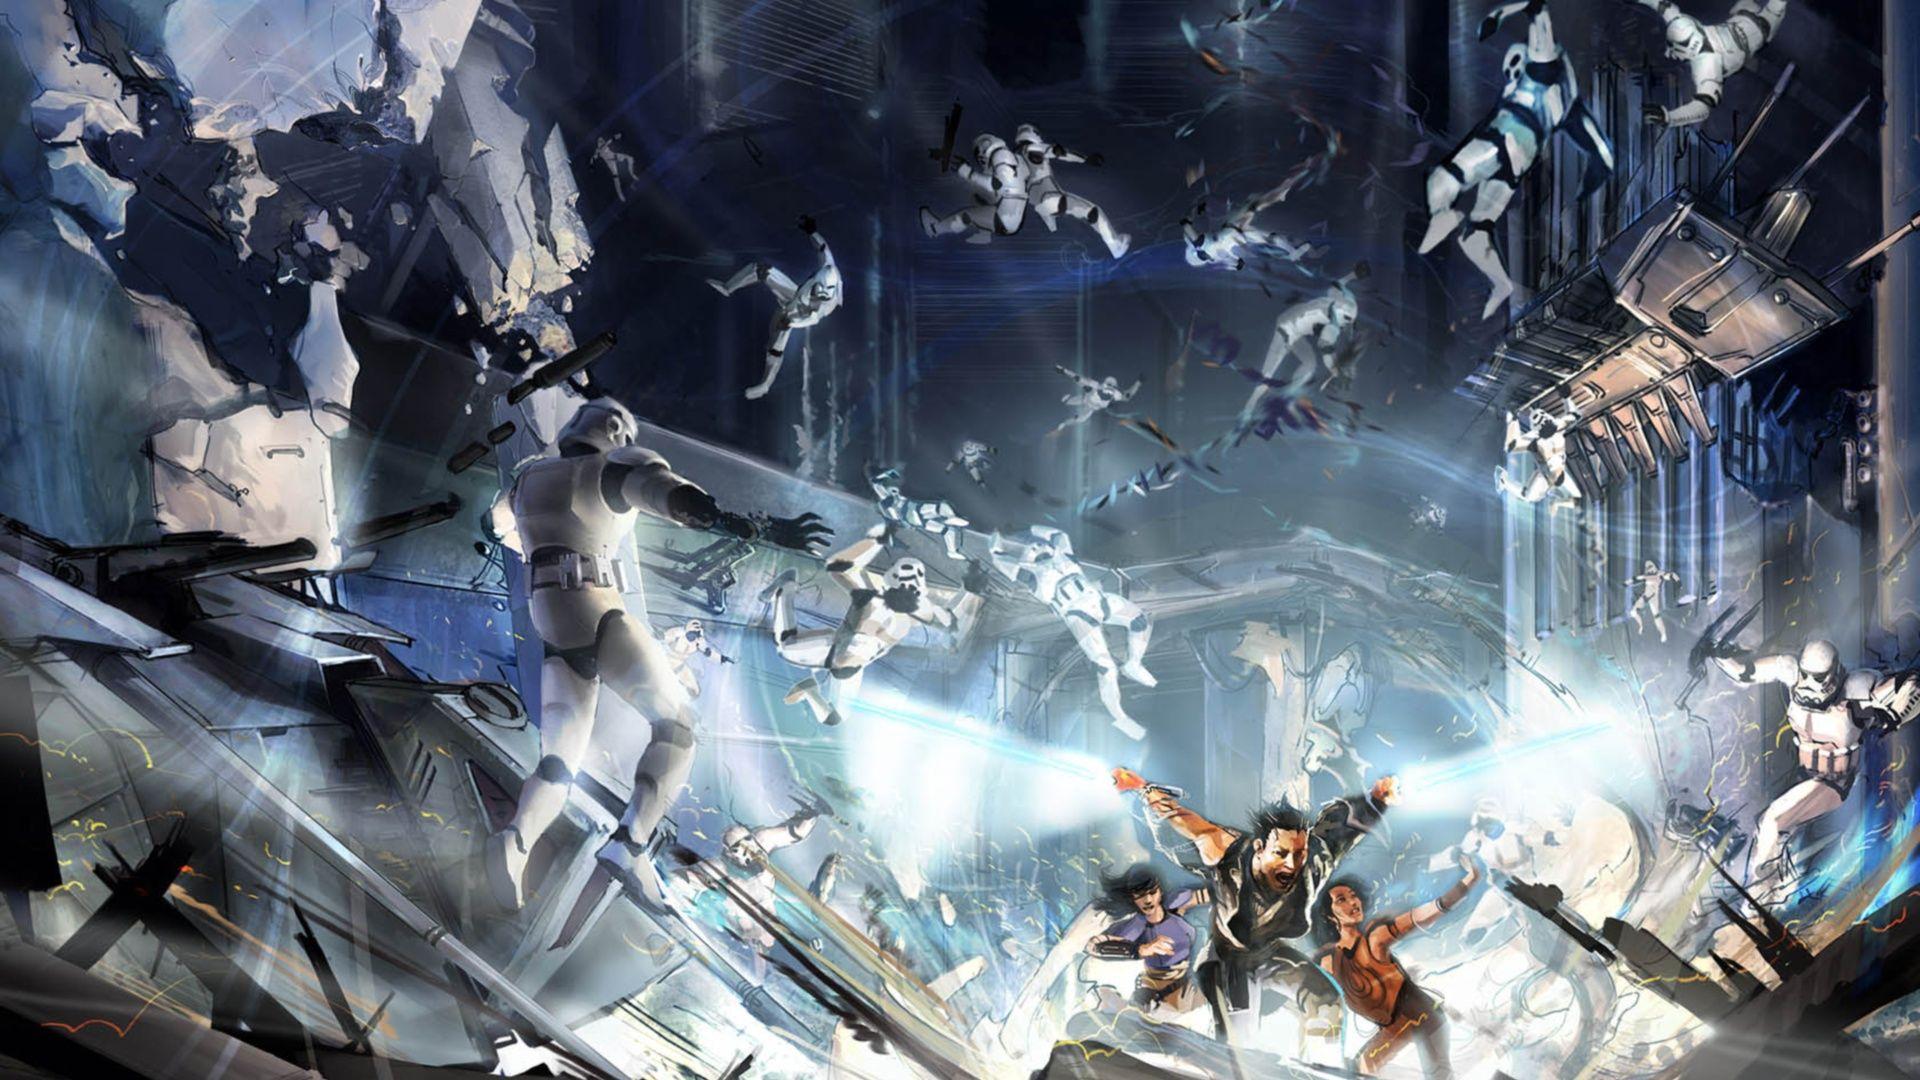 Star Wars Battle Backgrounds: Star-wars-battlefront-scifi-battle-wallpaper-star-wars